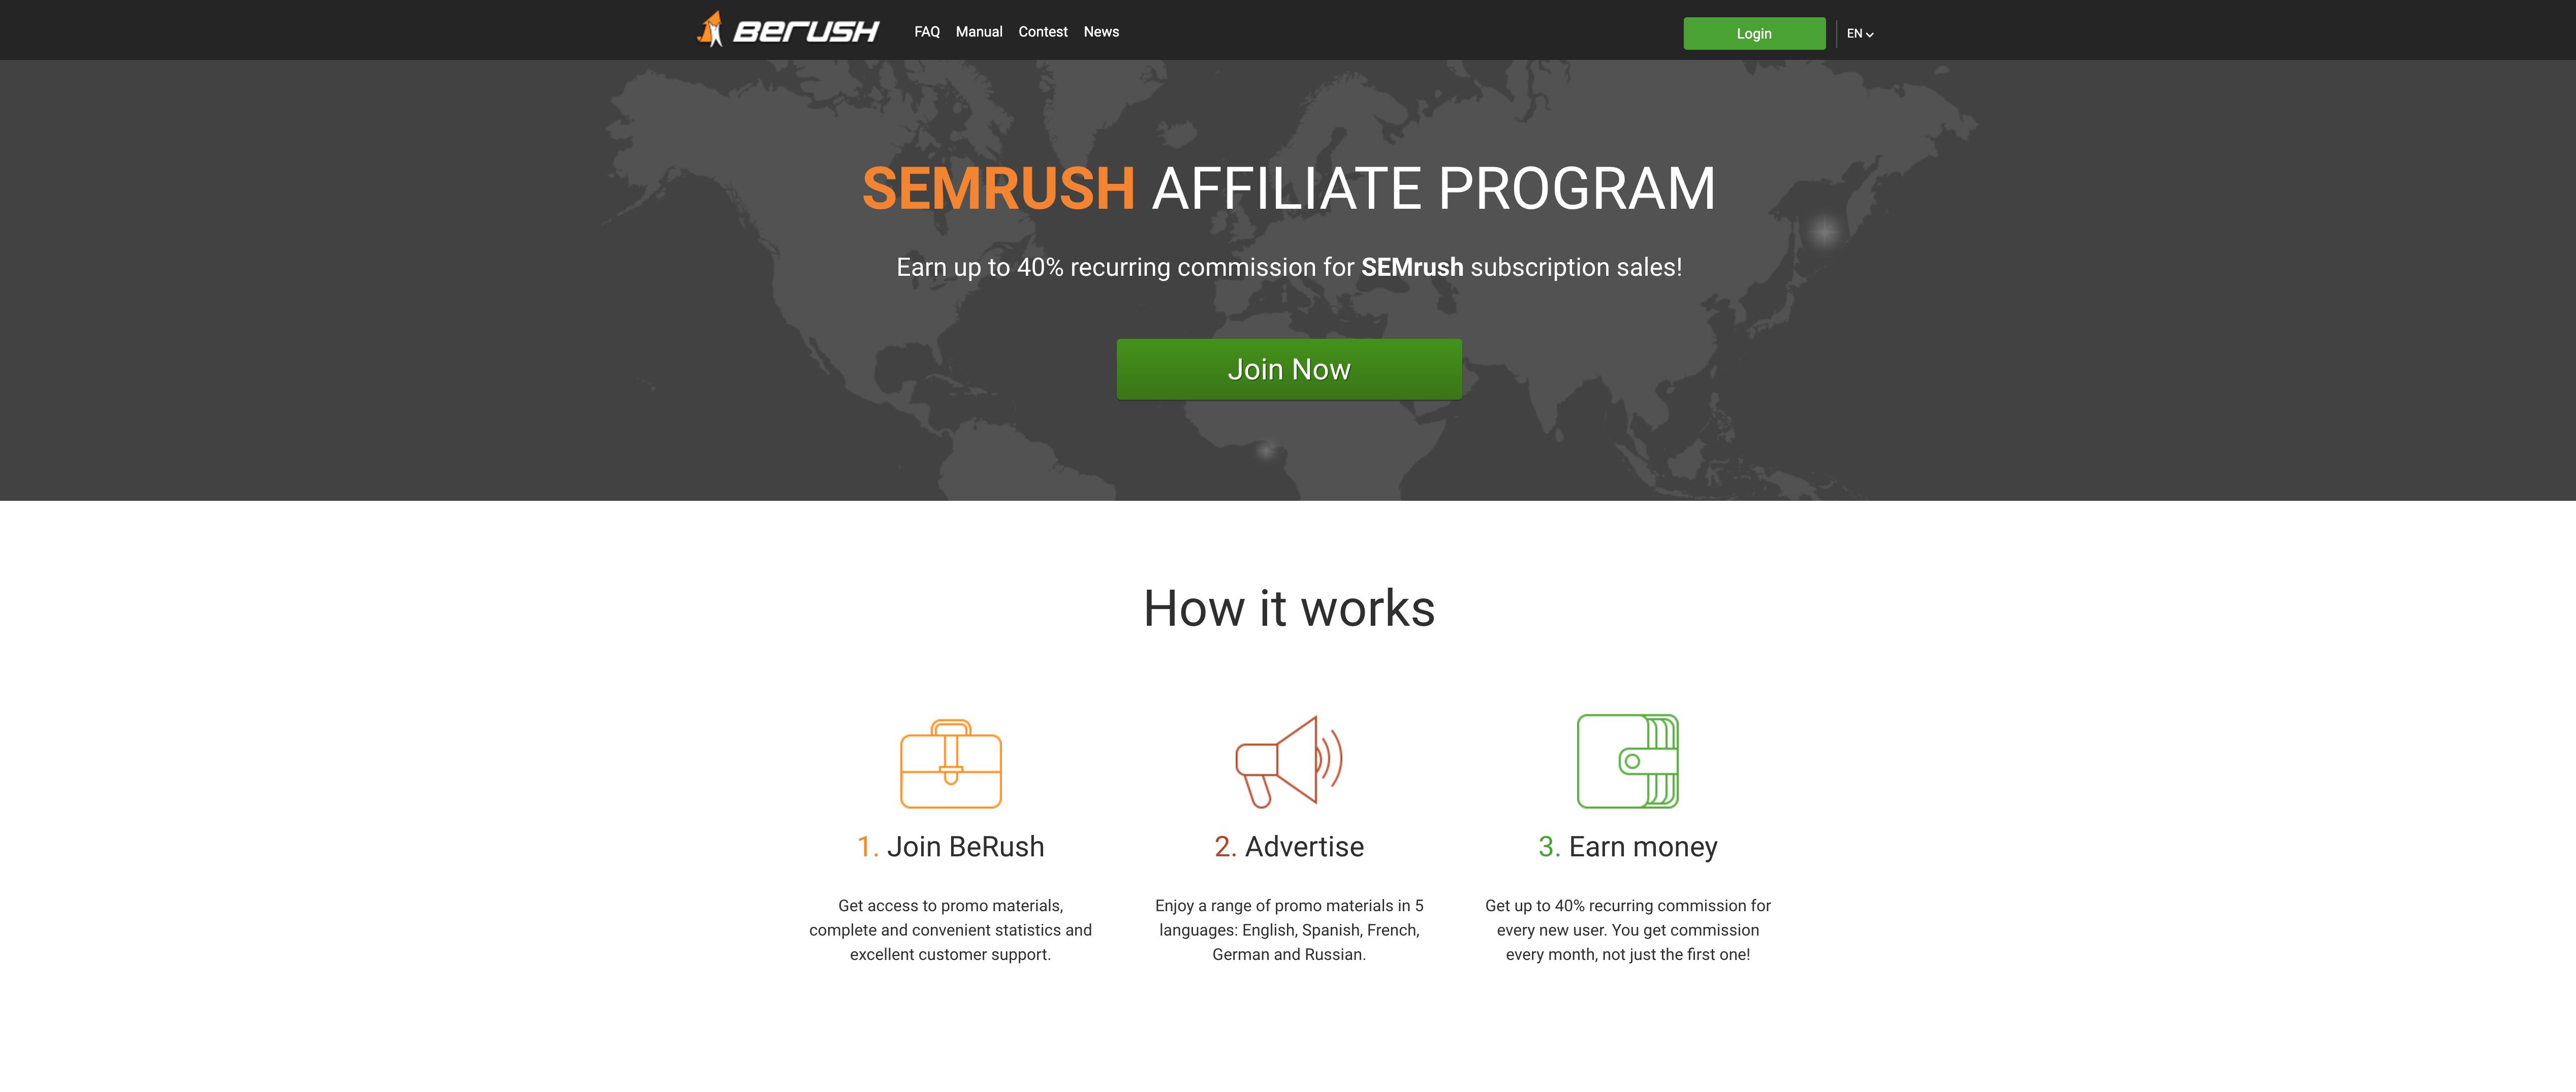 BeRush SEMrush tool